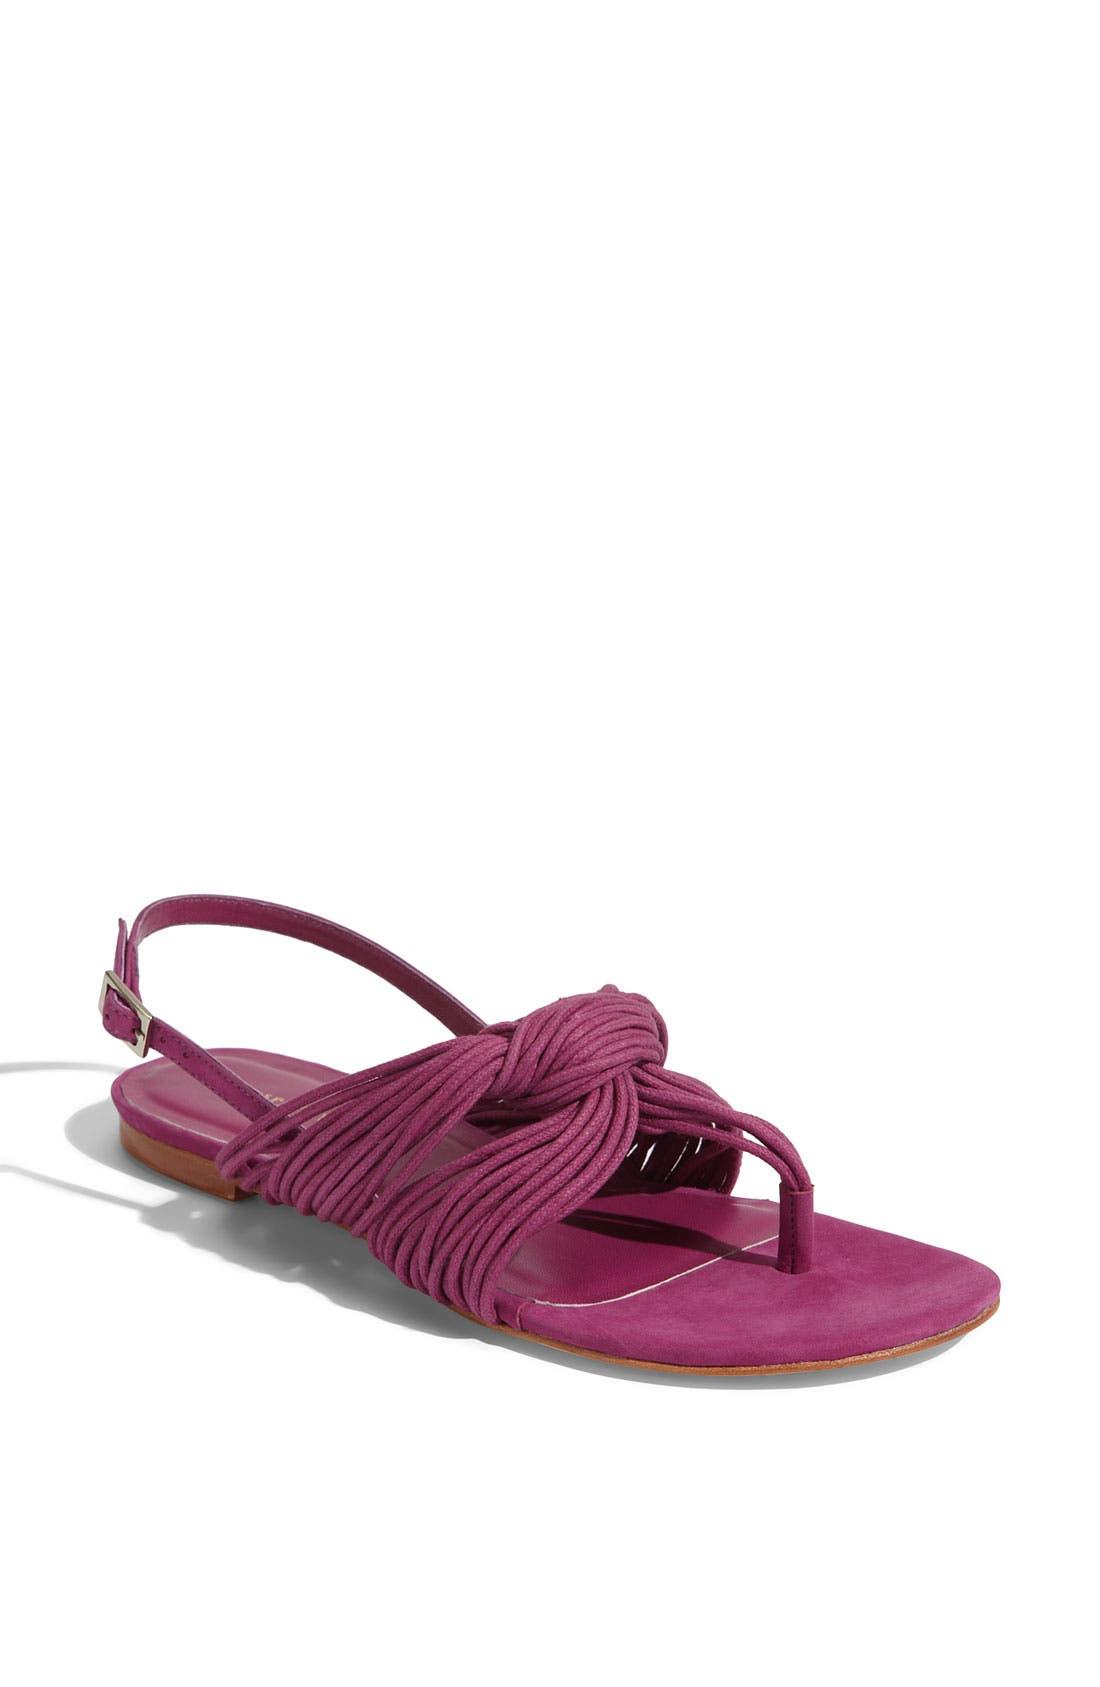 Alternate Image 1 Selected - Loeffler Randall 'Gioia' Sandal